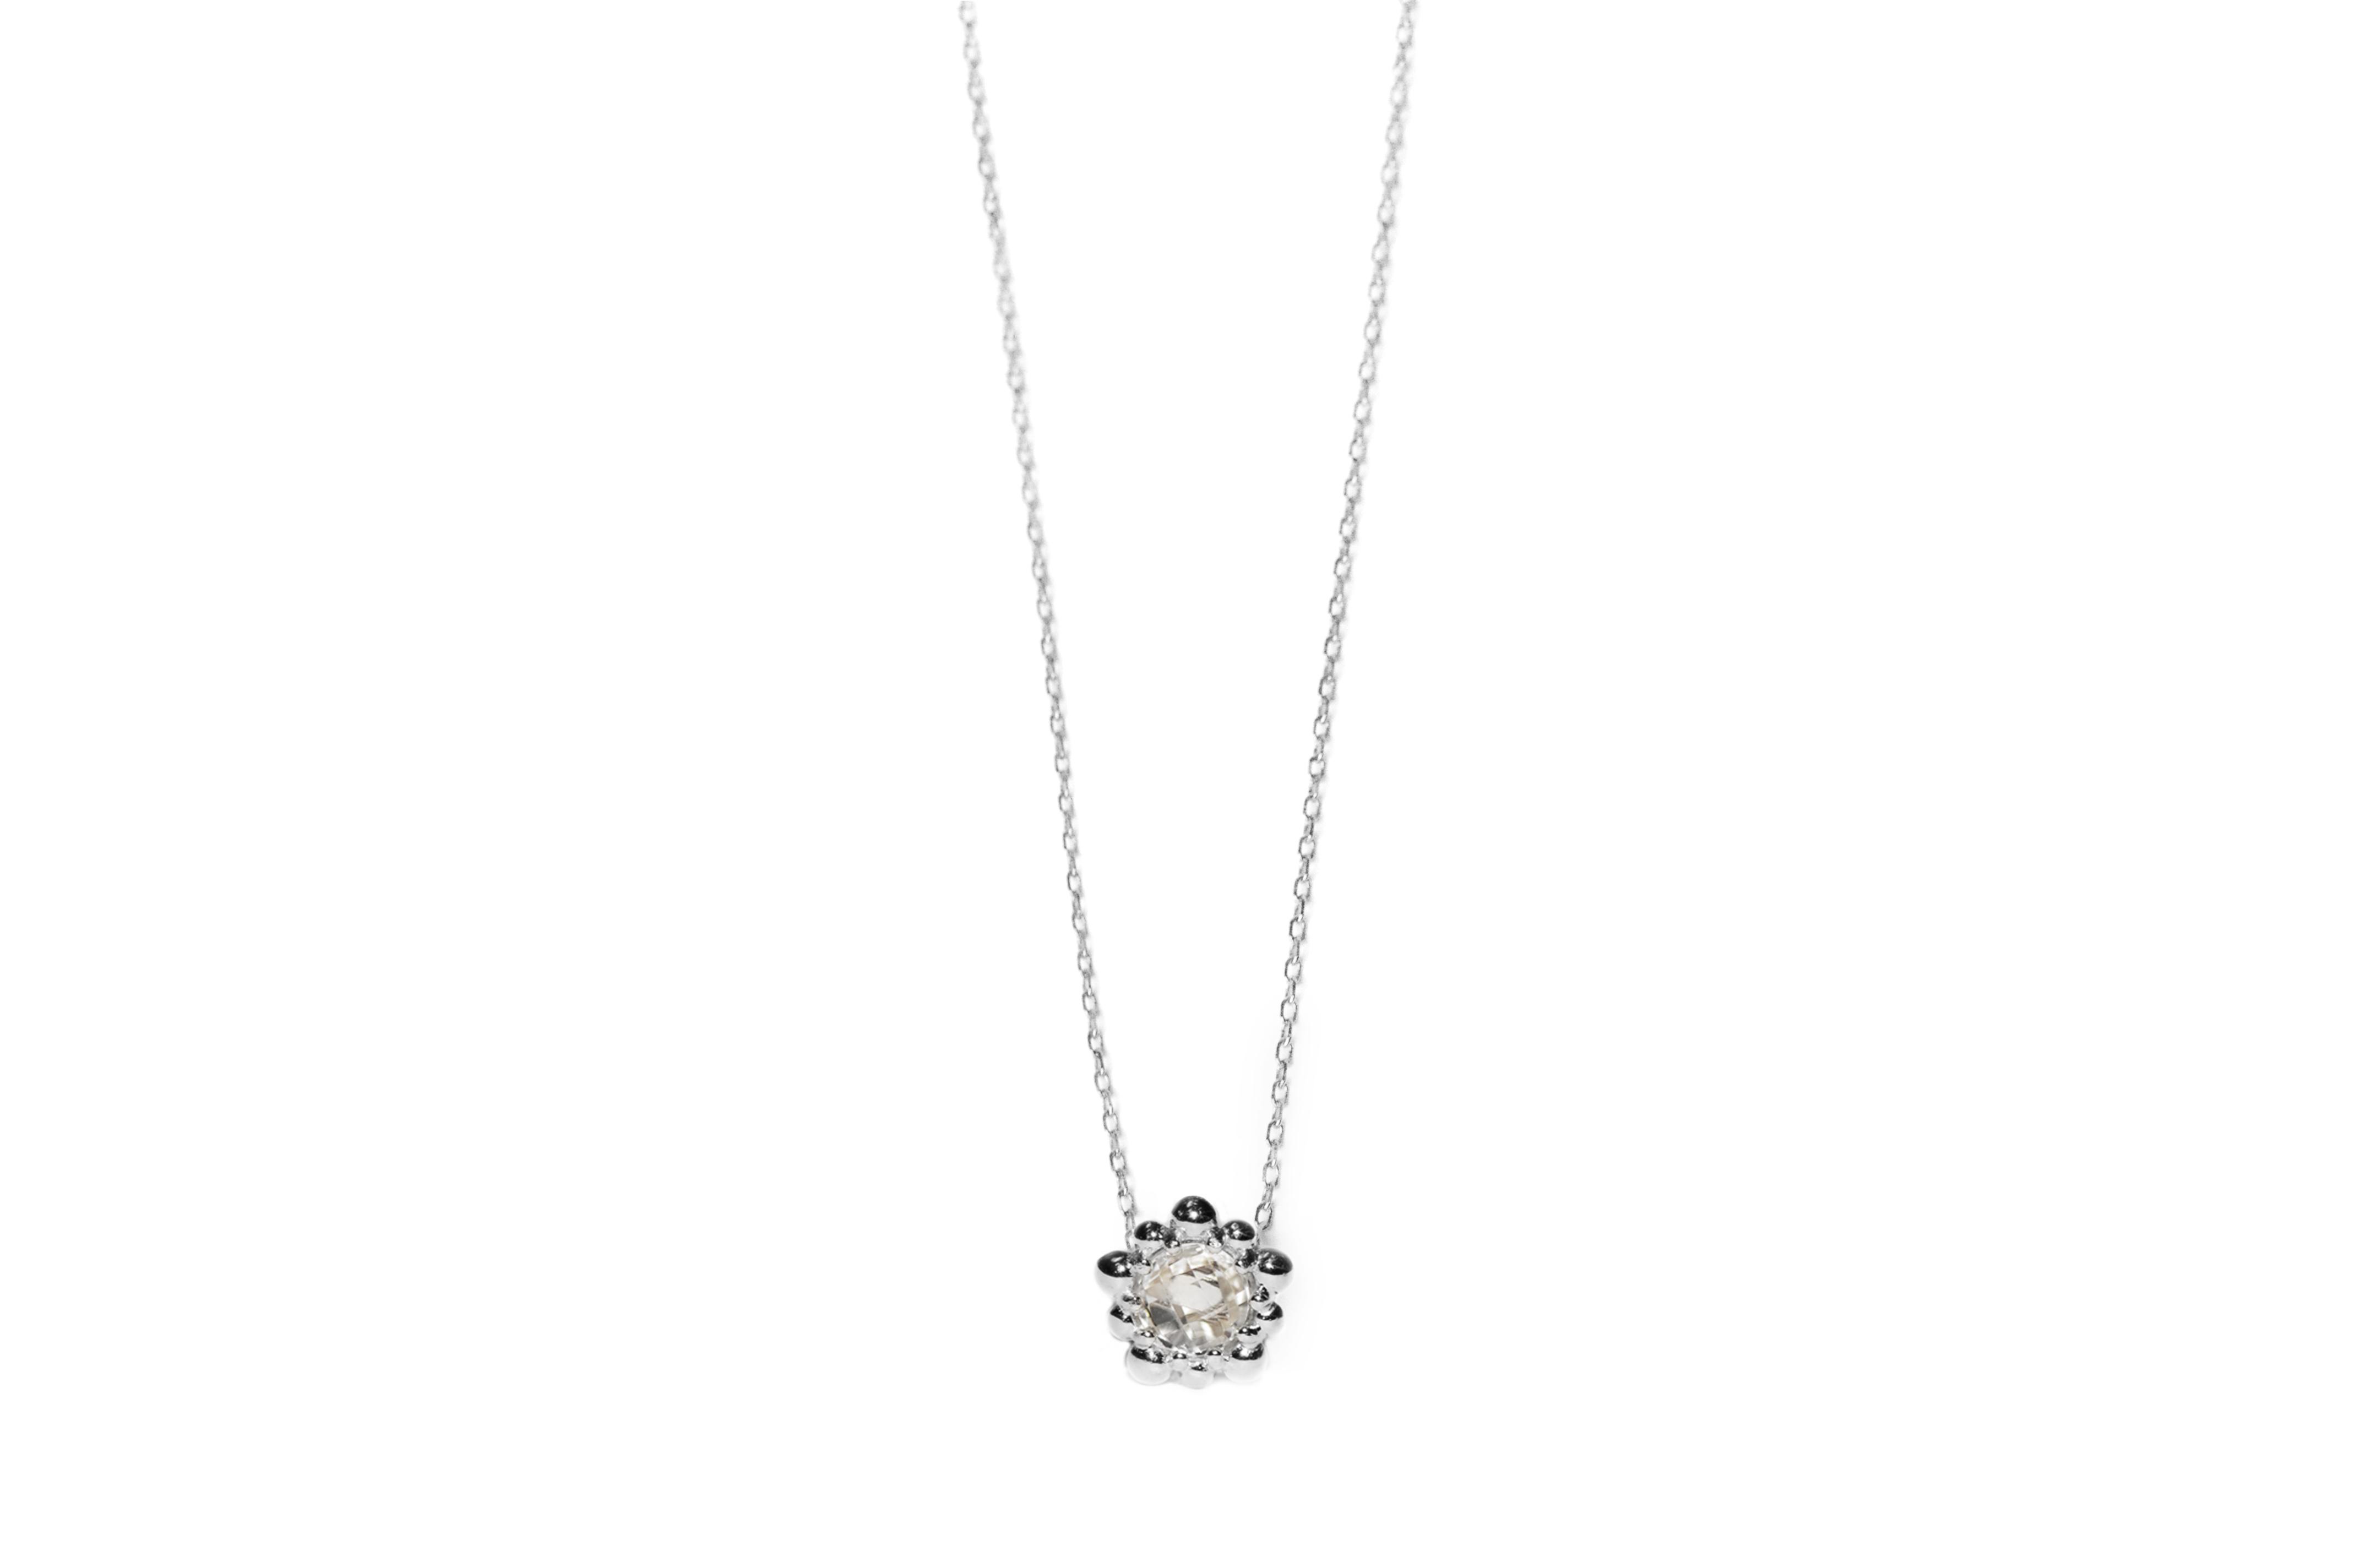 Anzie Micro Dew Drop Solitaire Necklace